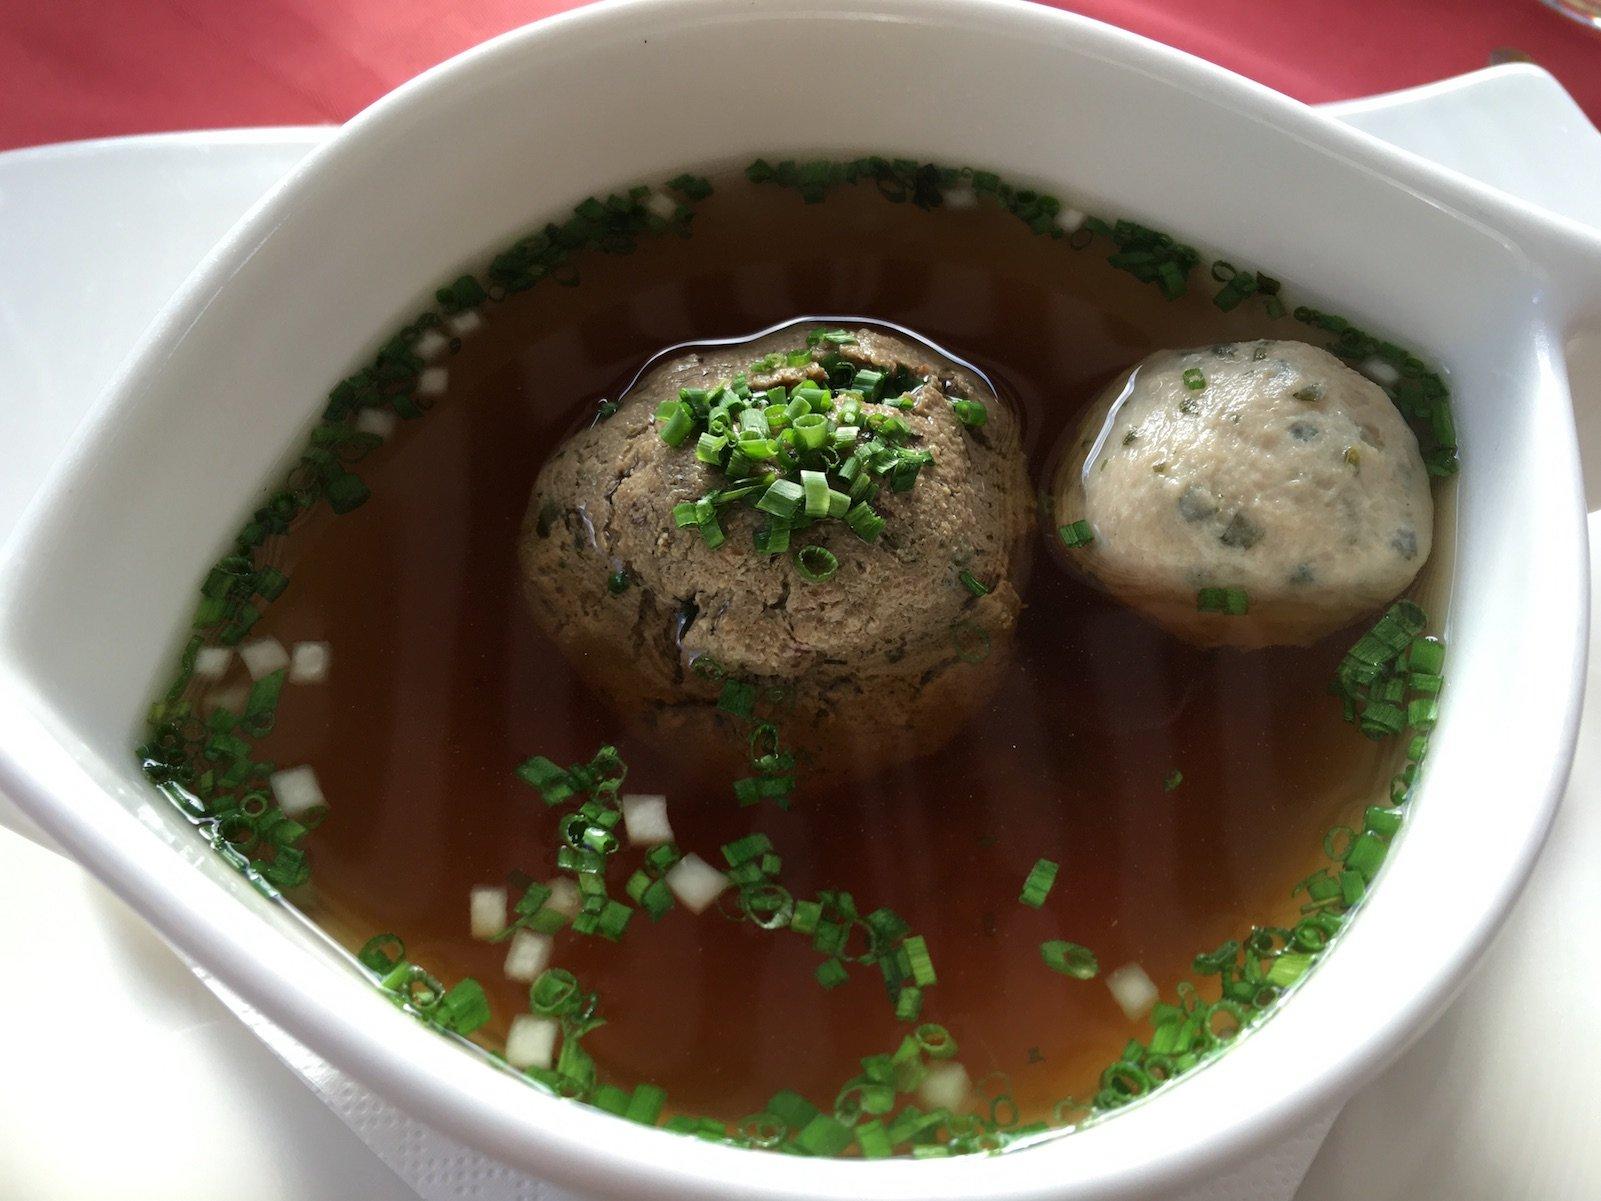 Kräftige Rindssuppe mit Leberknödel, Brätnockerl und Gemüsewürfel